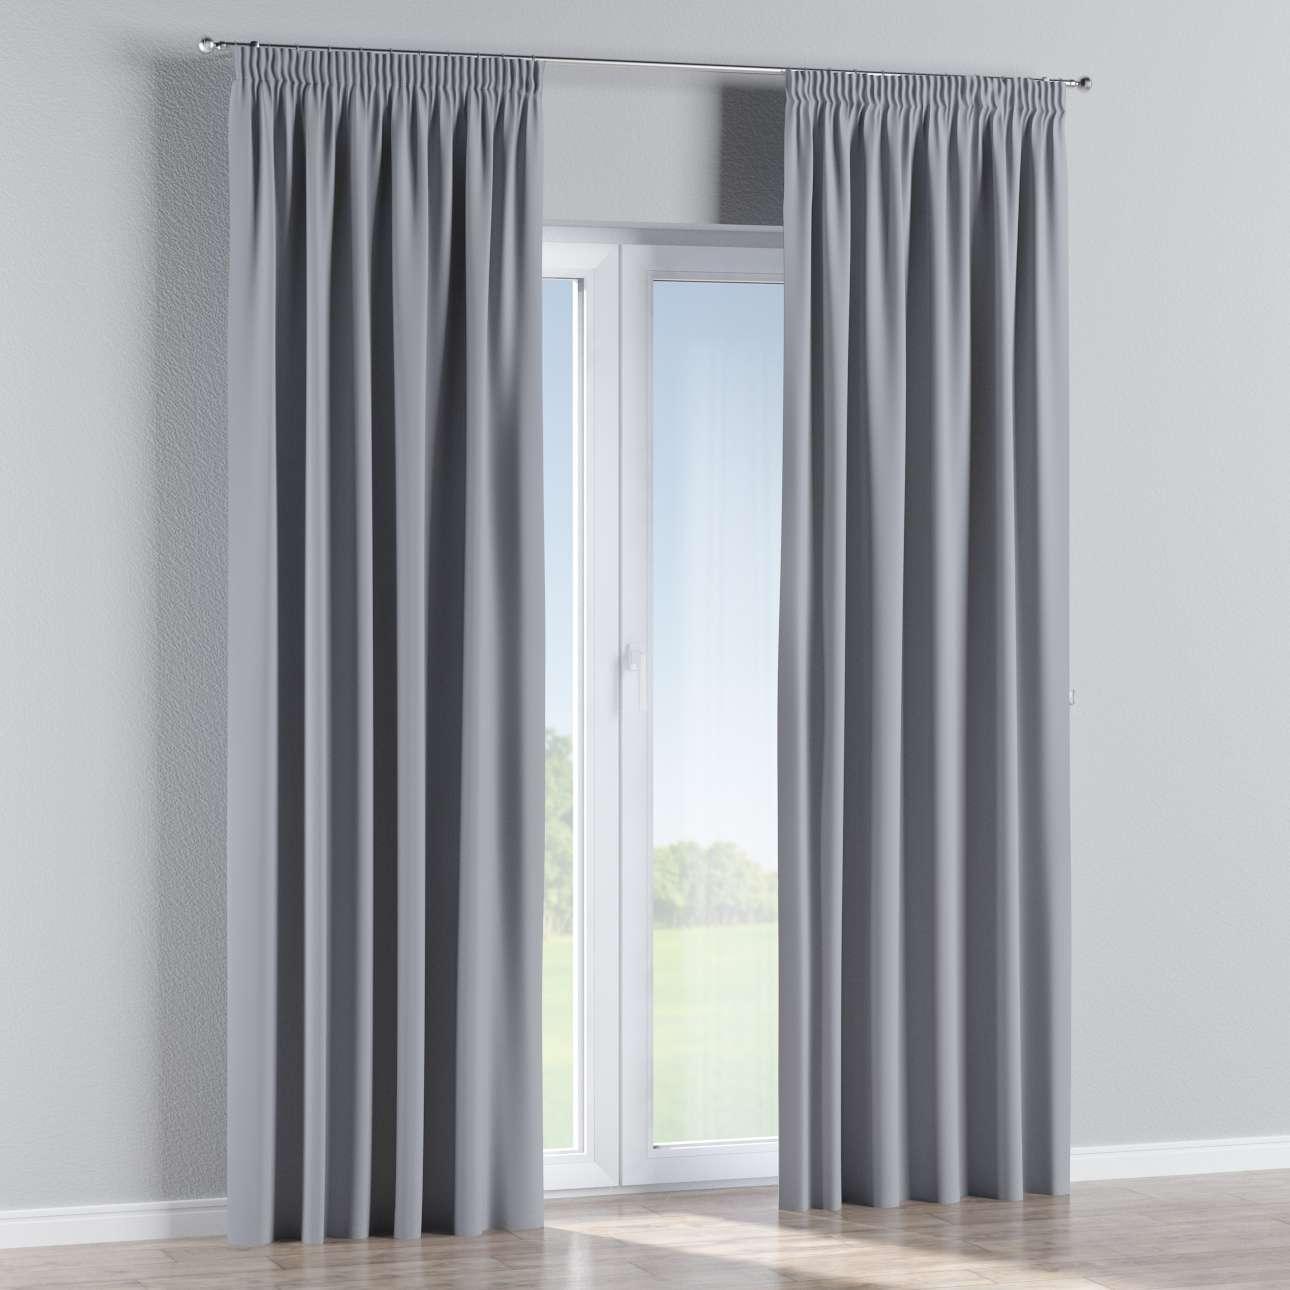 Blackout Pencil Pleat Curtains Light Grey Dekoria